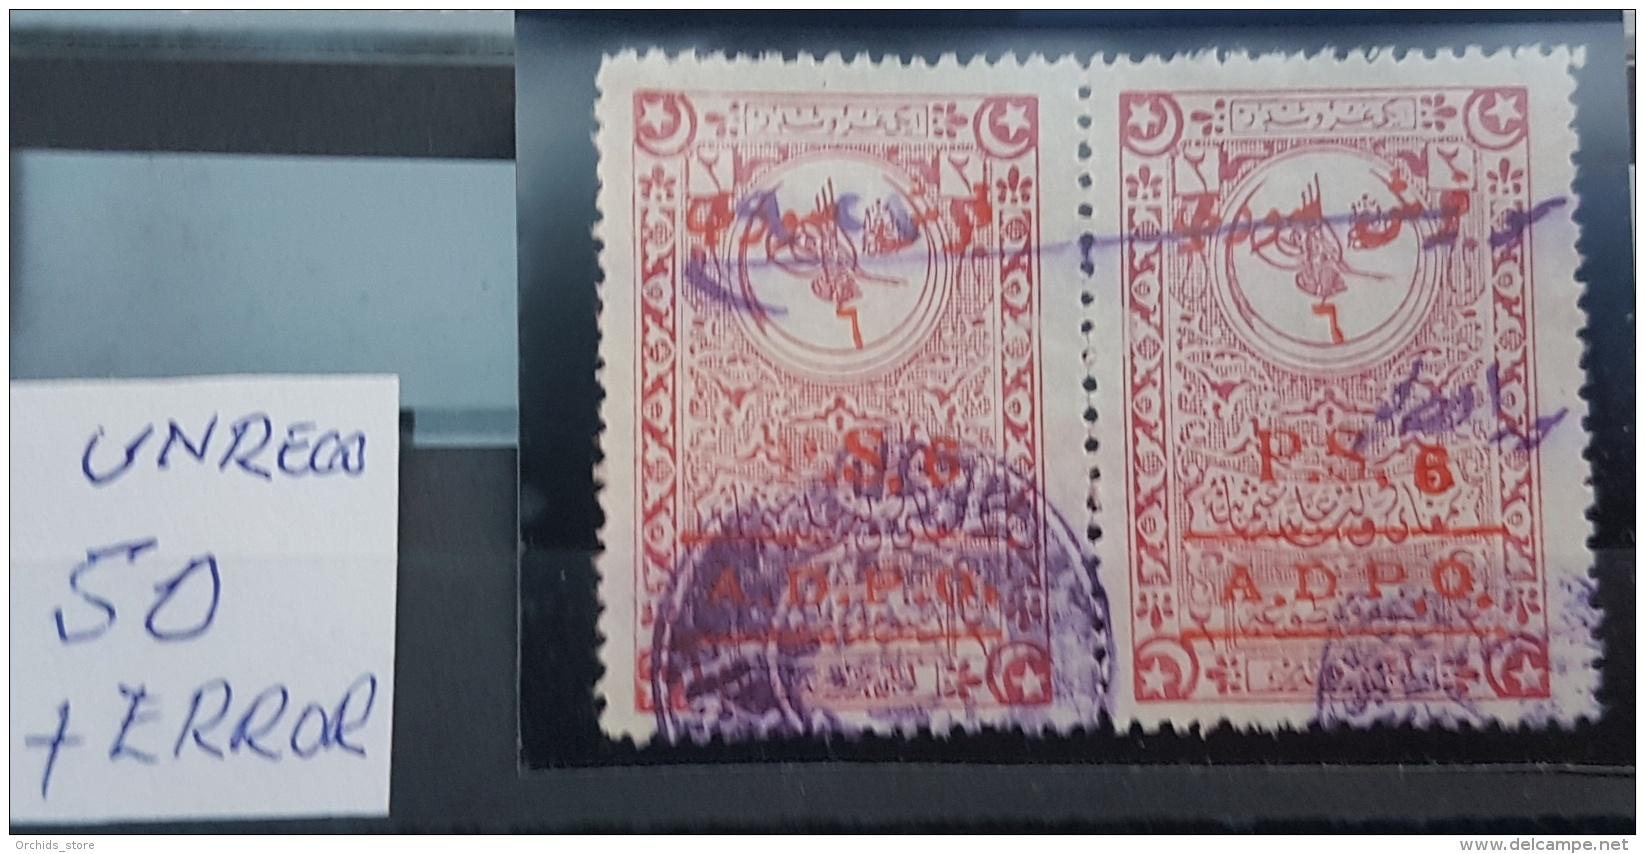 BB2 - Lebanon Syria ADPO Ottoman (Type 7) Fixed Fee Revenue Stamp PS 6 Ovpt 2, UNrecorded Pair With Error - Lebanon